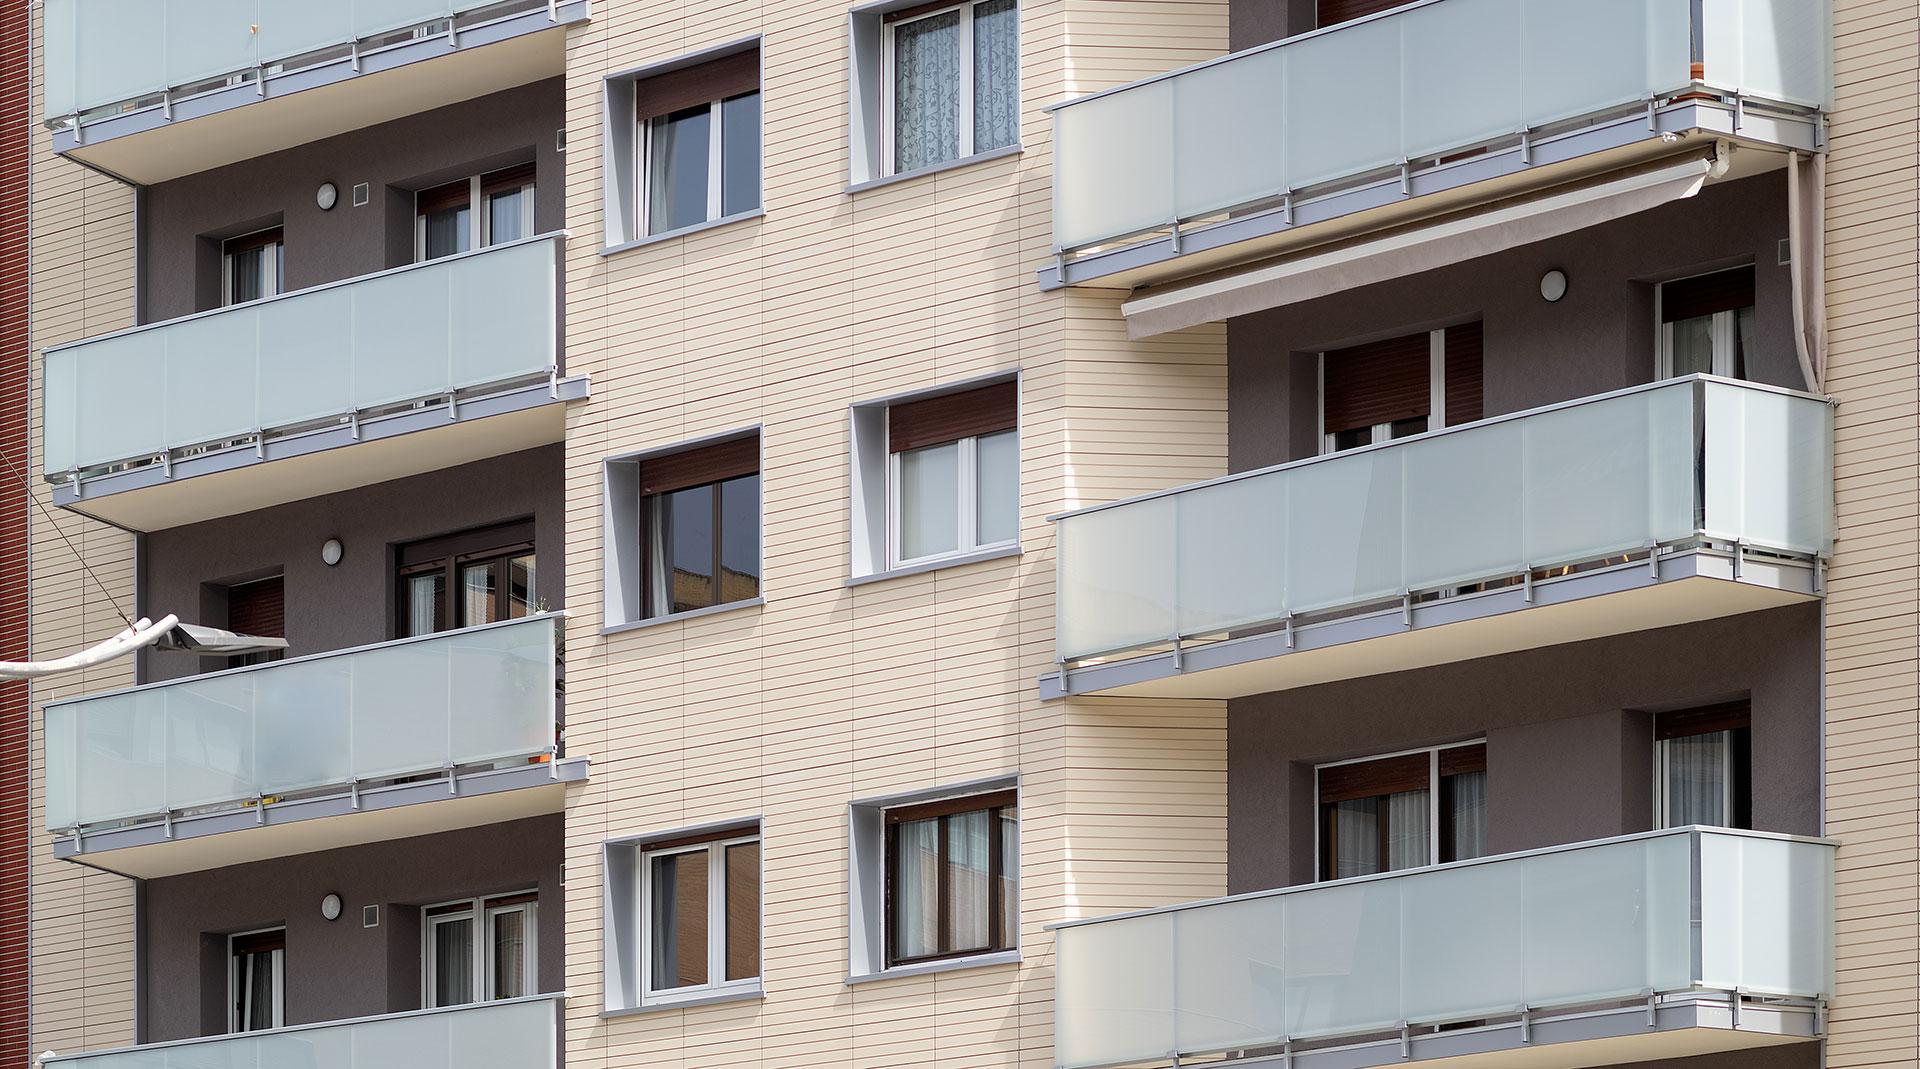 Rehabilitacion-energetica-fachada_ventilada-ceramica_BASA-Arquitectura-San-Sebastian-Donosti_2_b